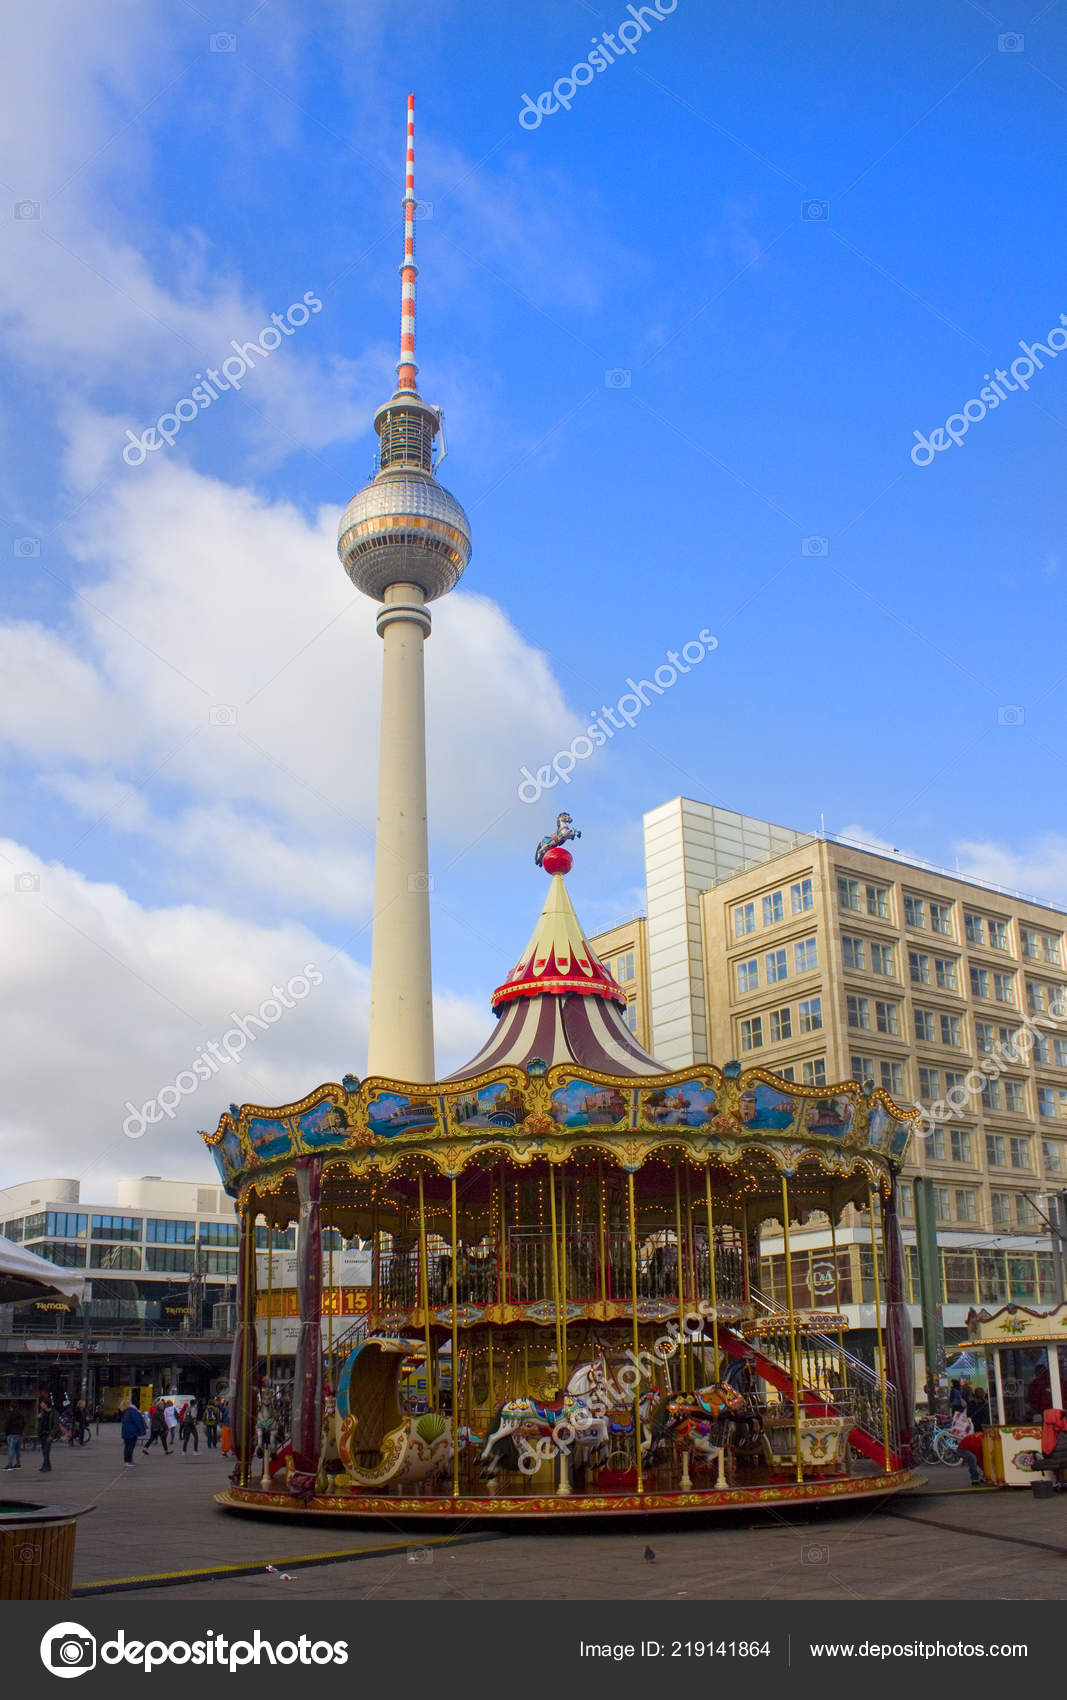 berlin germany september 2018